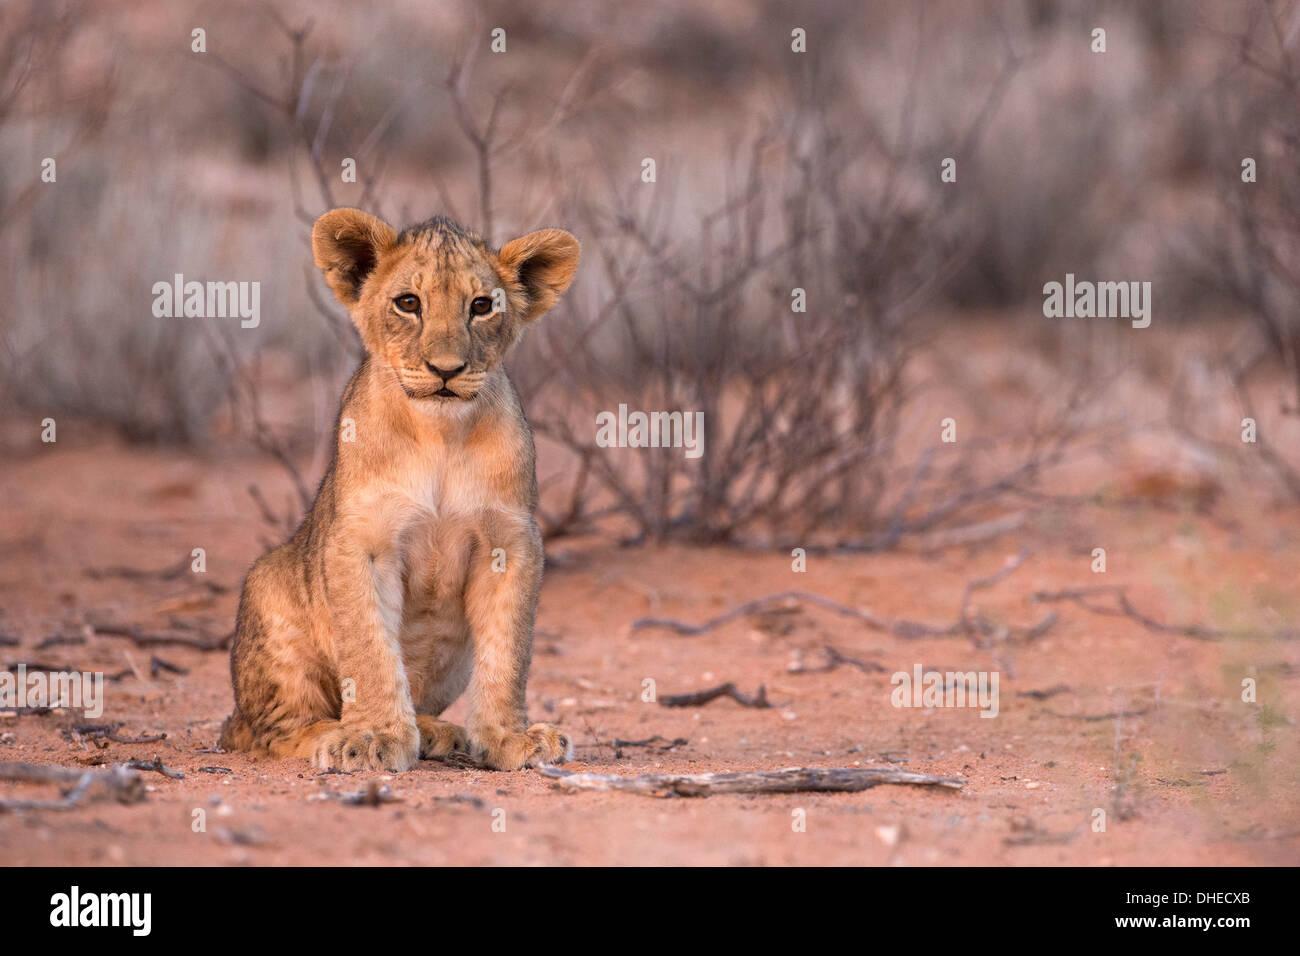 Lion cub (Panthera leo), Kgalagadi Transfrontier Park, South Africa, Africa - Stock Image